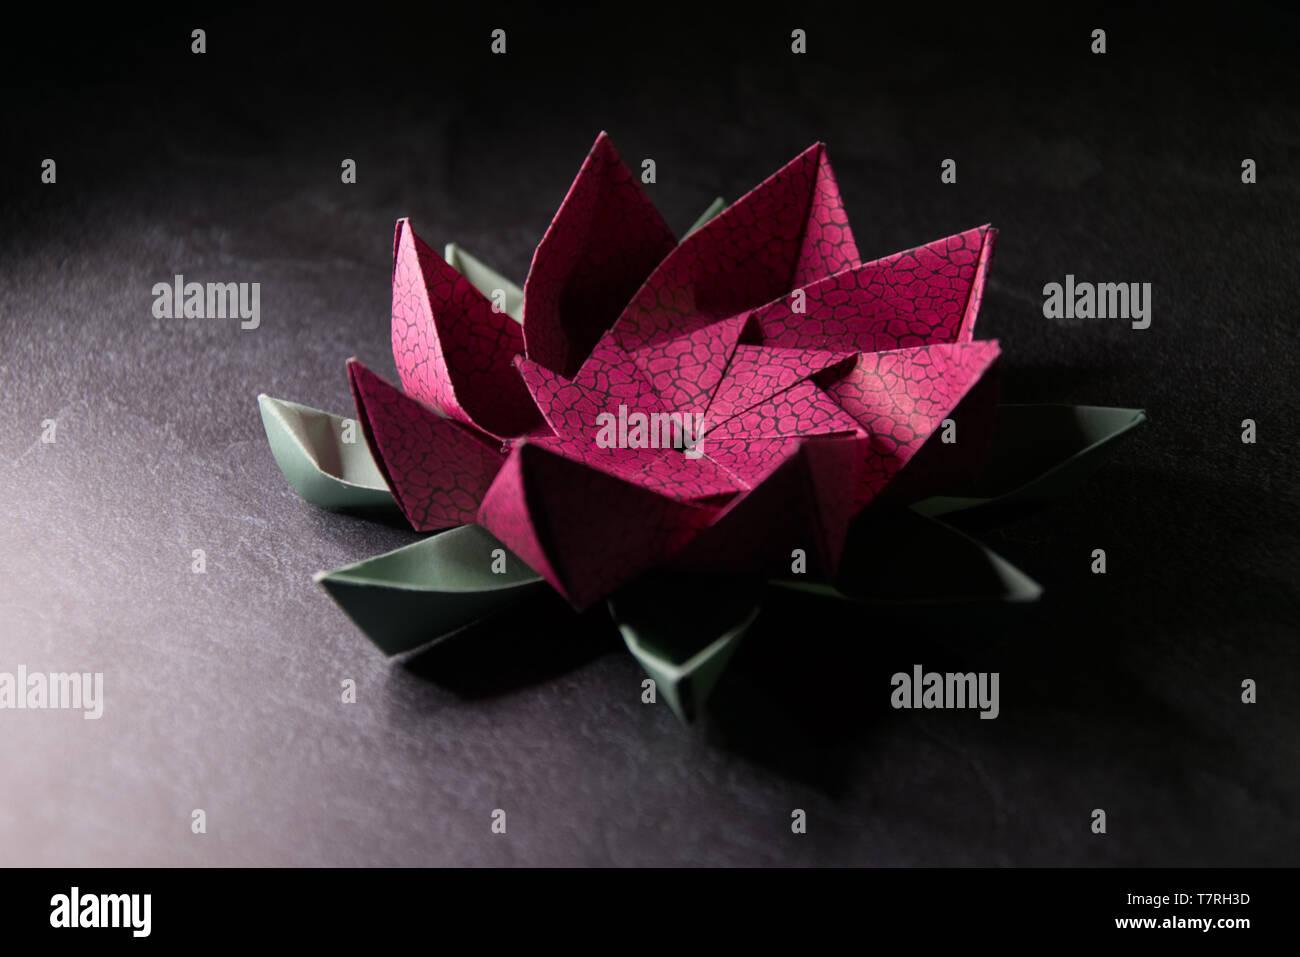 Origami 8 Petal Modular Lotus Flower - Paper Kawaii - YouTube | 957x1300